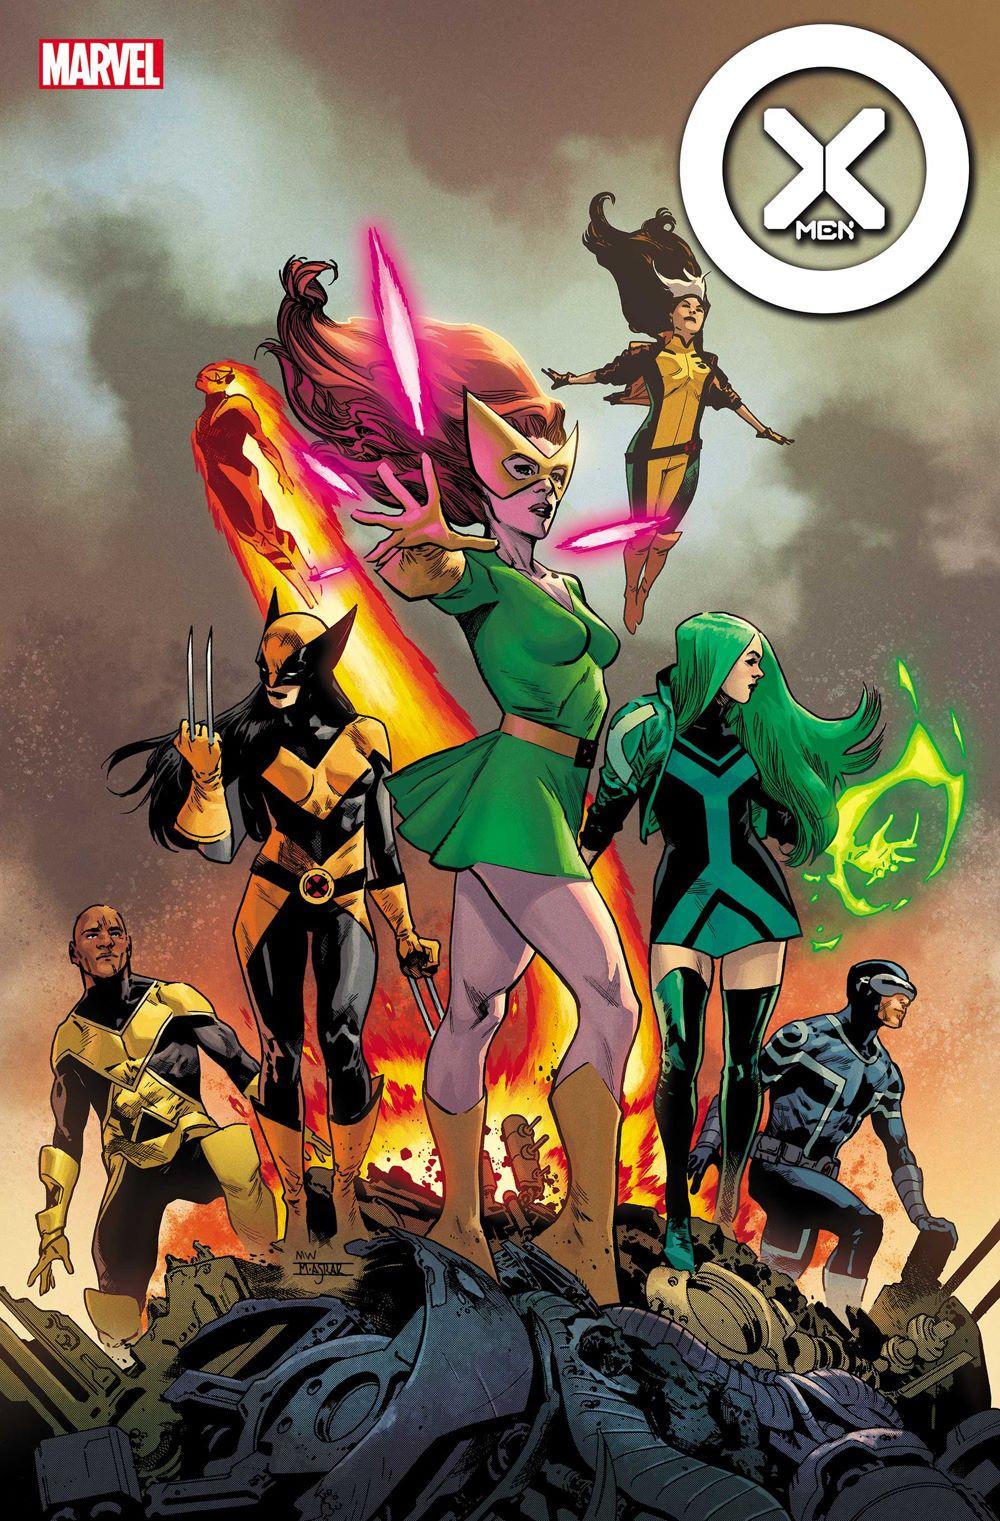 XMEN2021002_Asrar-var Marvel Comics August 2021 Solicitations